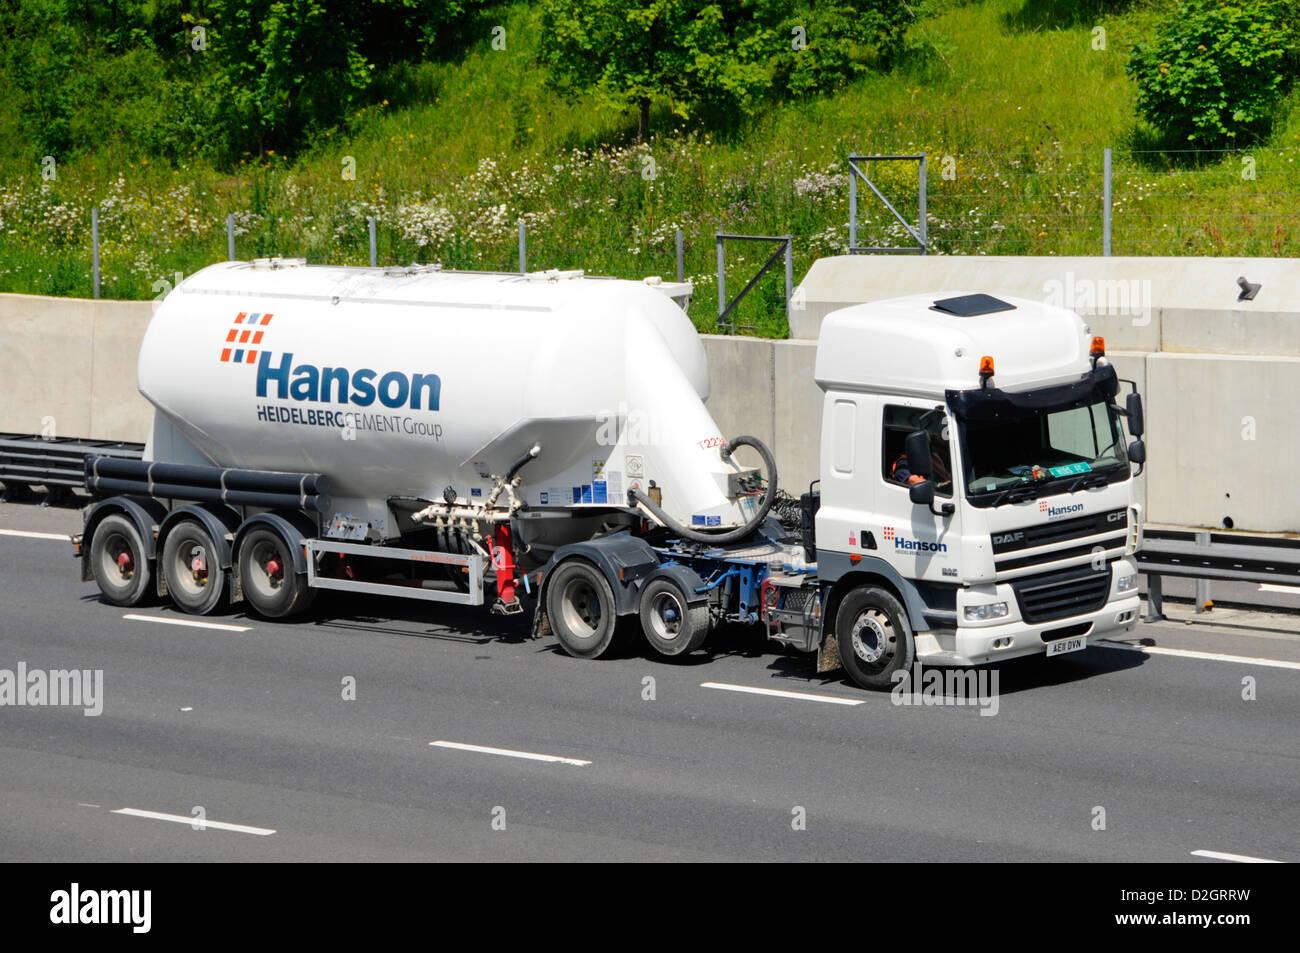 Hanson Heidelberg cement bulk tanker trailer and lorry with raised axle travelling on UK motorway - Stock Image